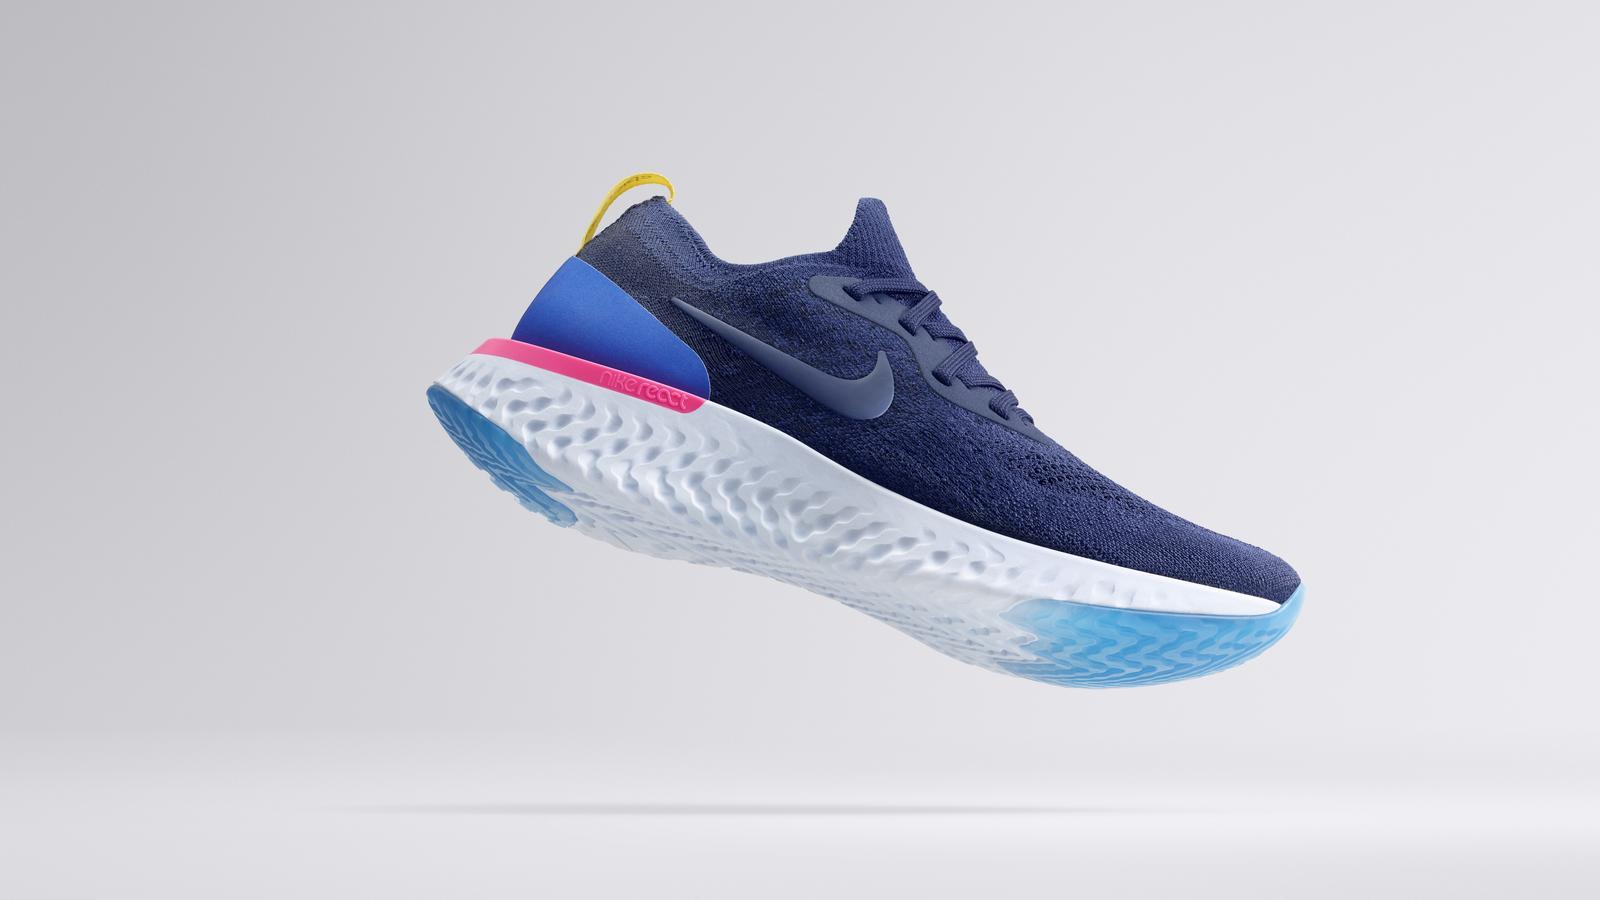 Nike Fresh Arrival Shoes